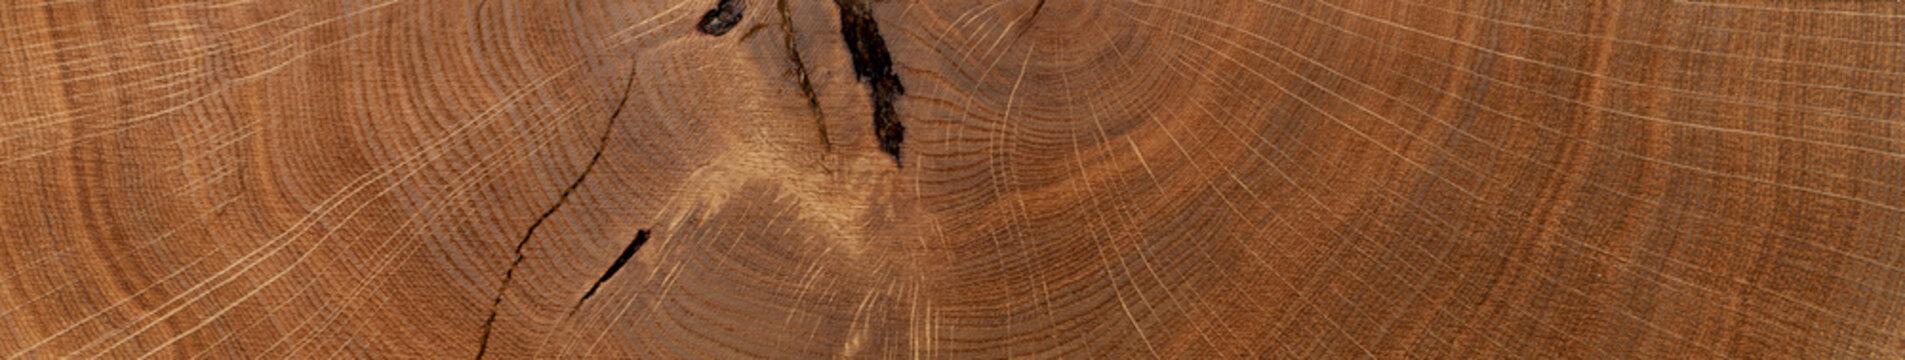 end grain wood texture of Oak tree